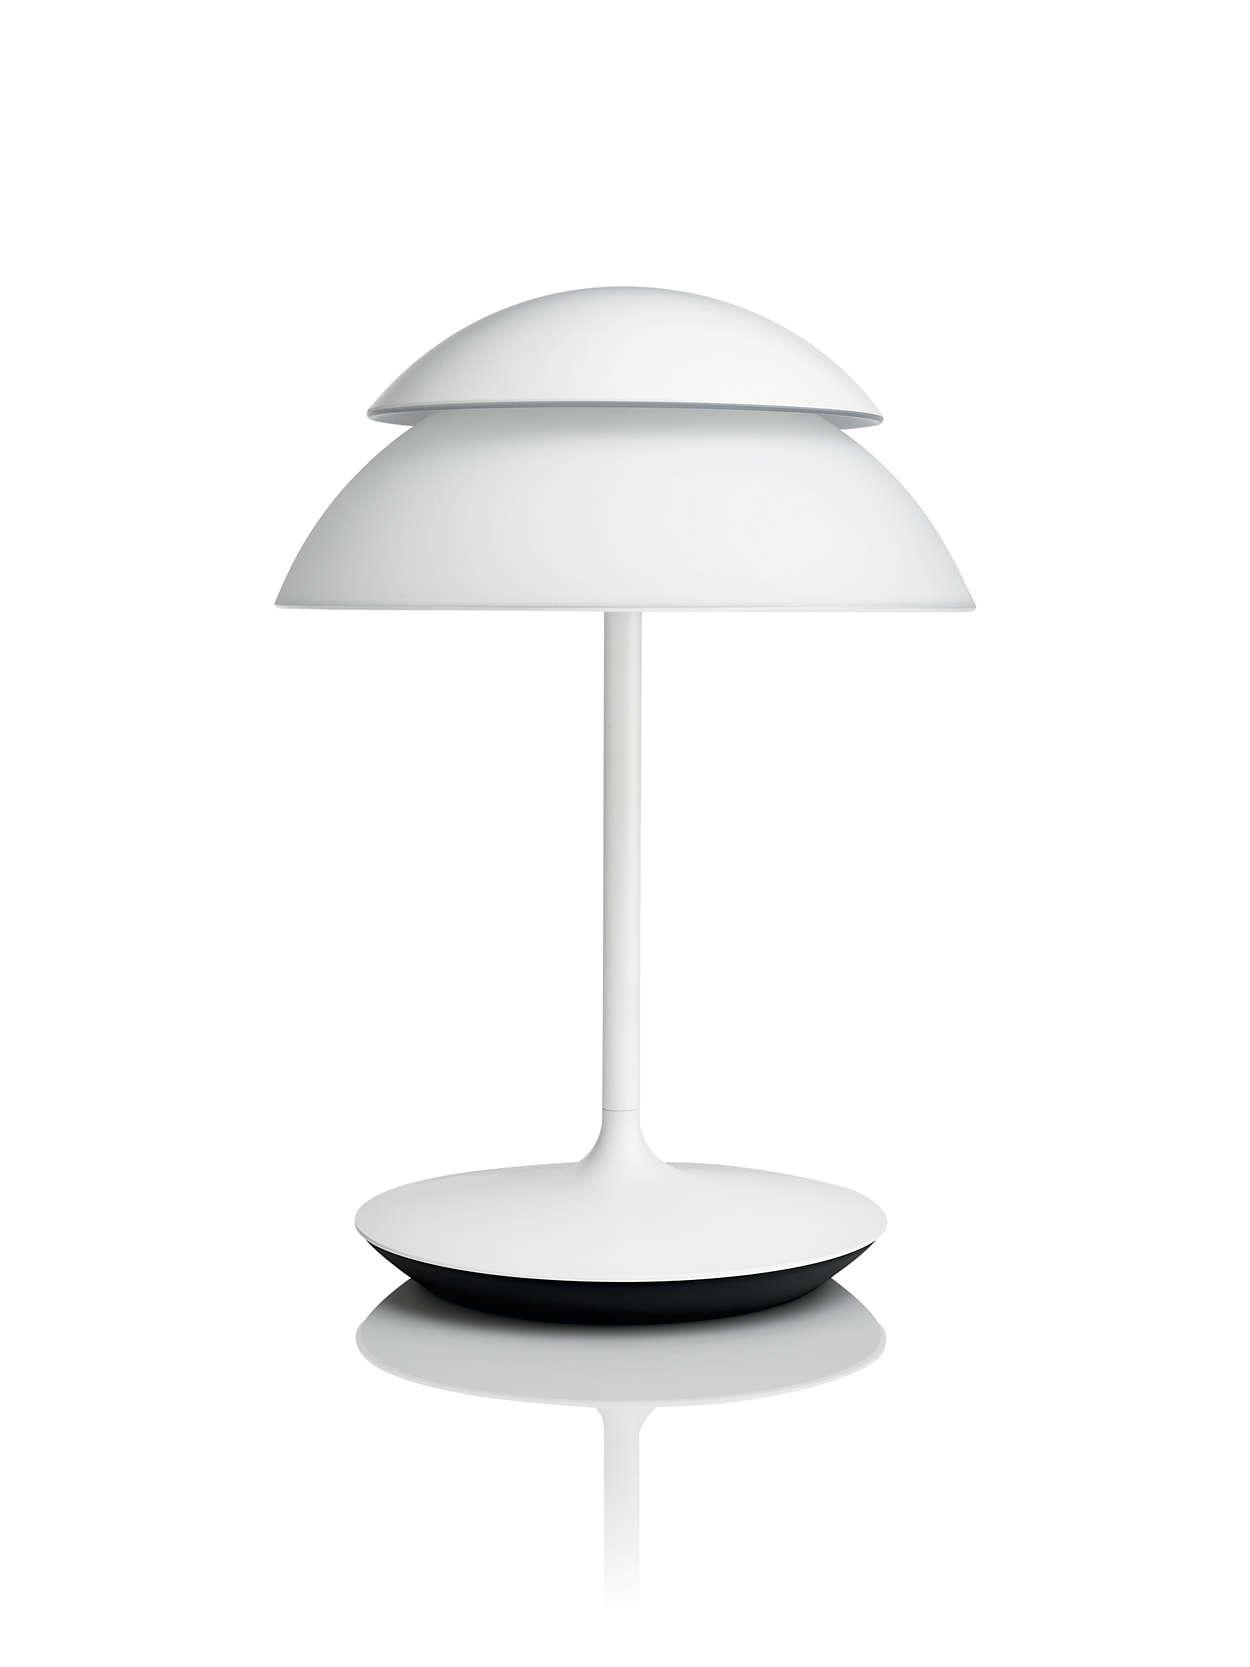 hue white and color ambiance lampe de table beyond. Black Bedroom Furniture Sets. Home Design Ideas